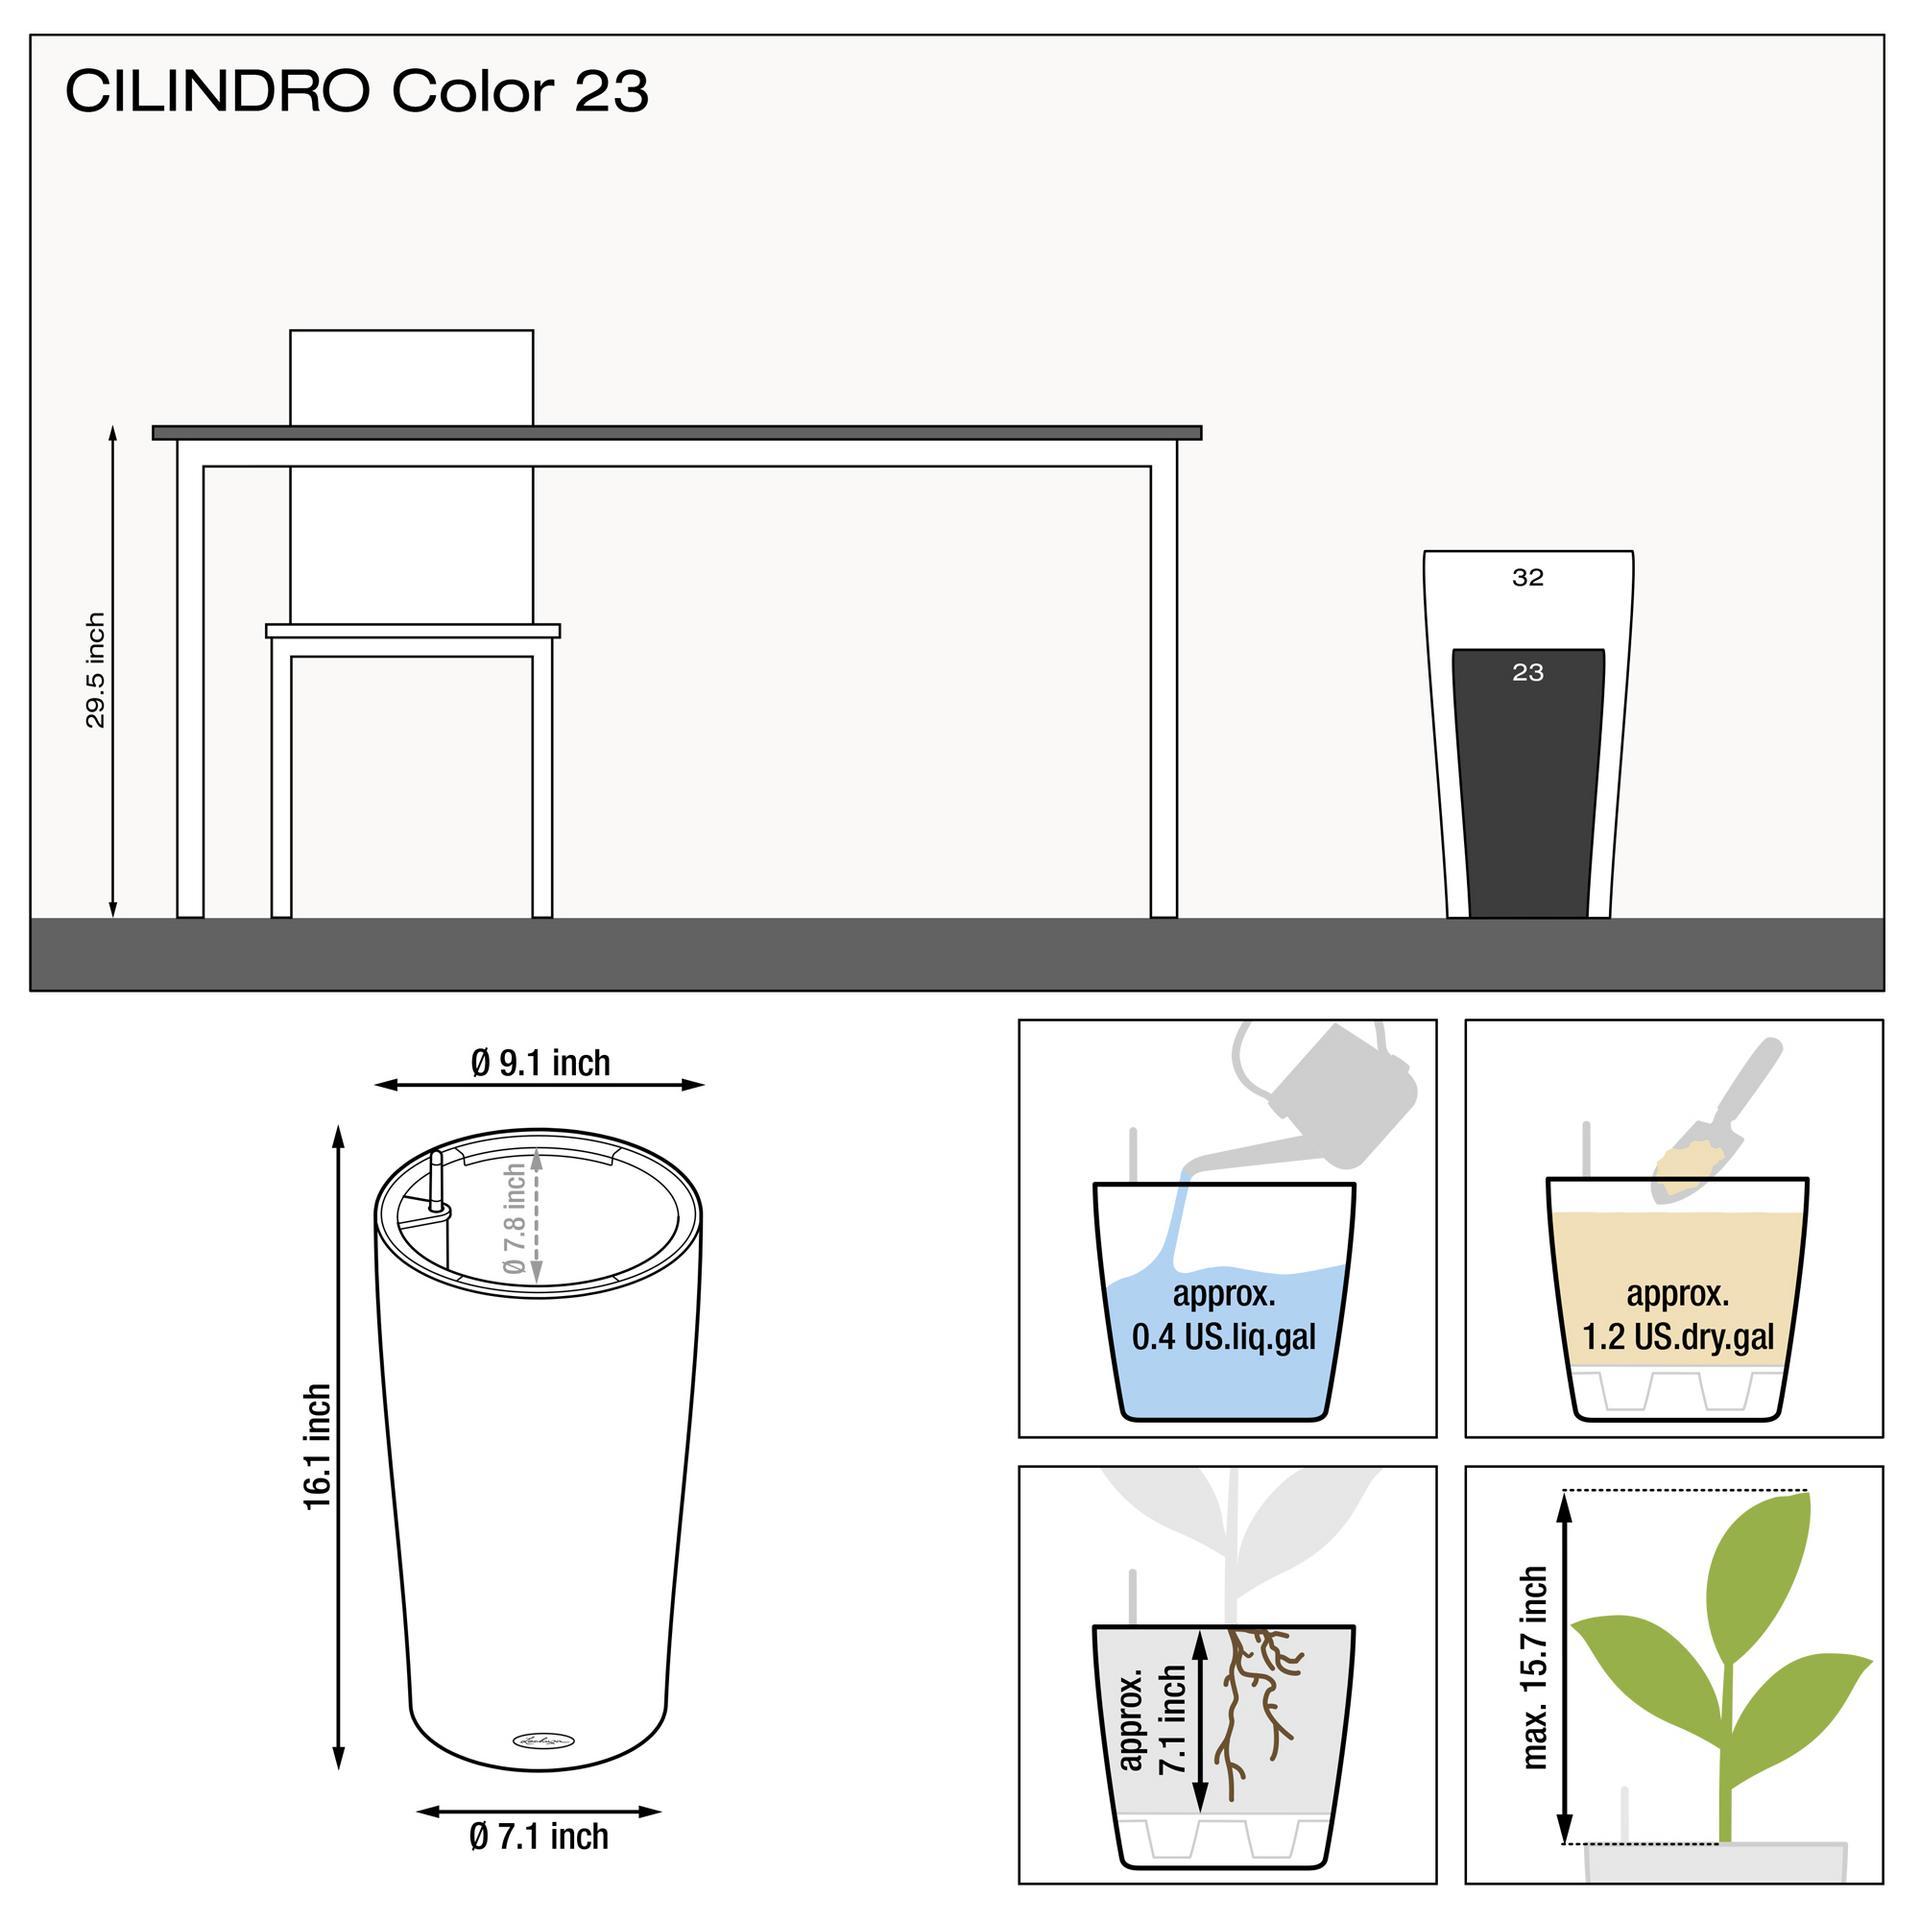 le_cilindro-color23_product_addi_nz_us